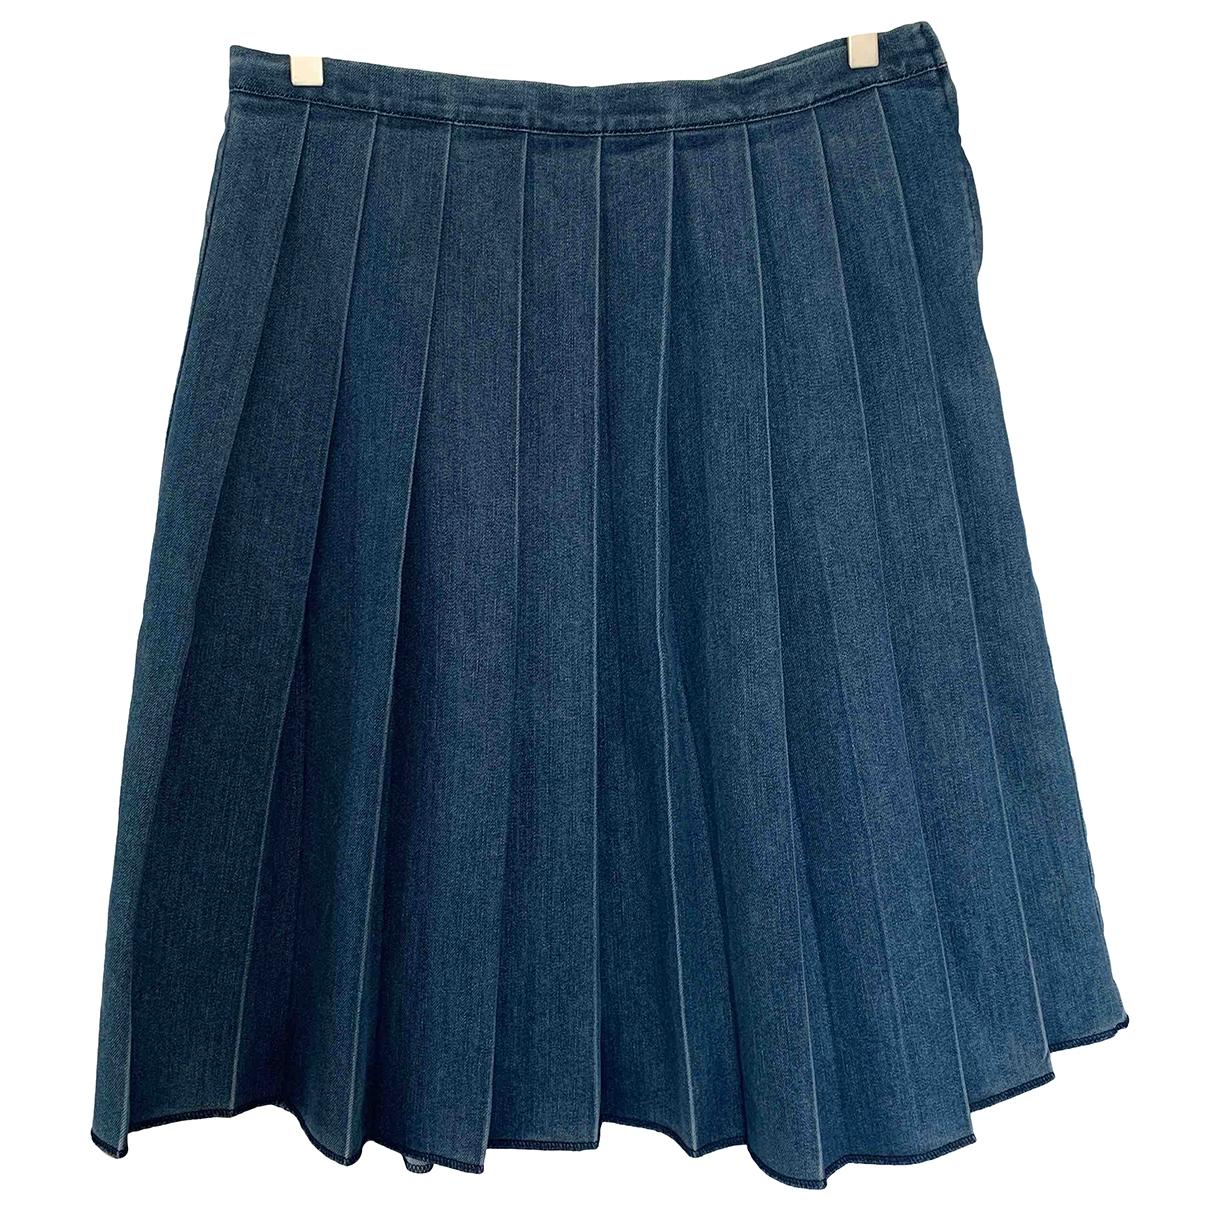 Mads Nørgaard \N Blue Denim - Jeans skirt for Women M International